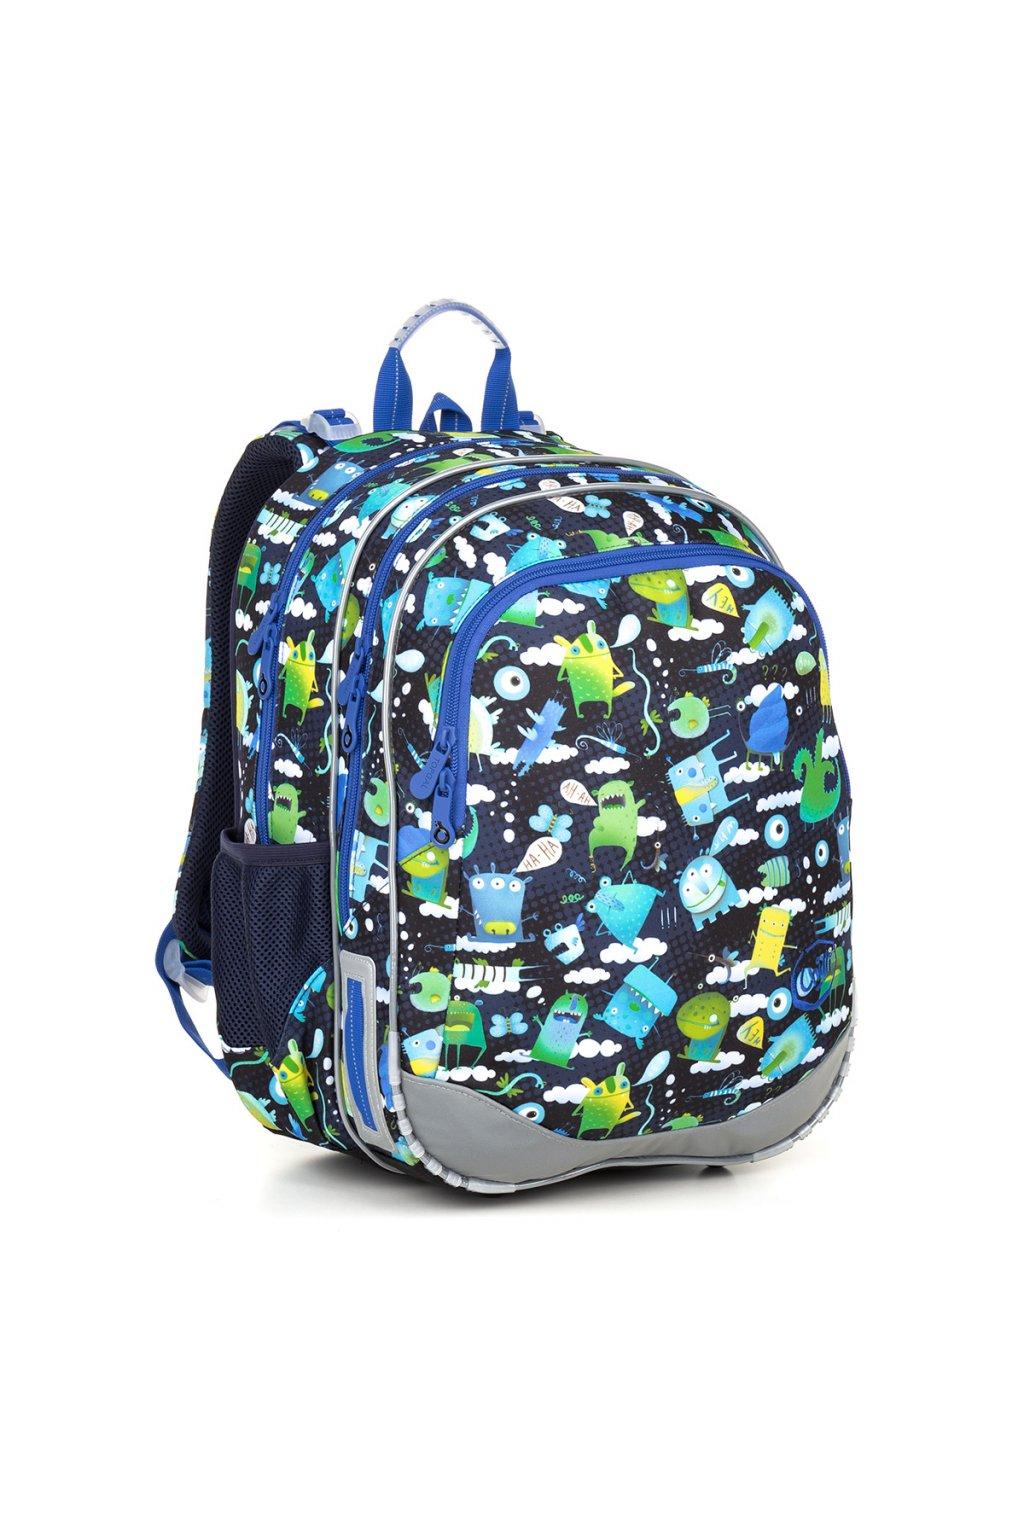 chlapecký školní batoh topgal elly 18002 b